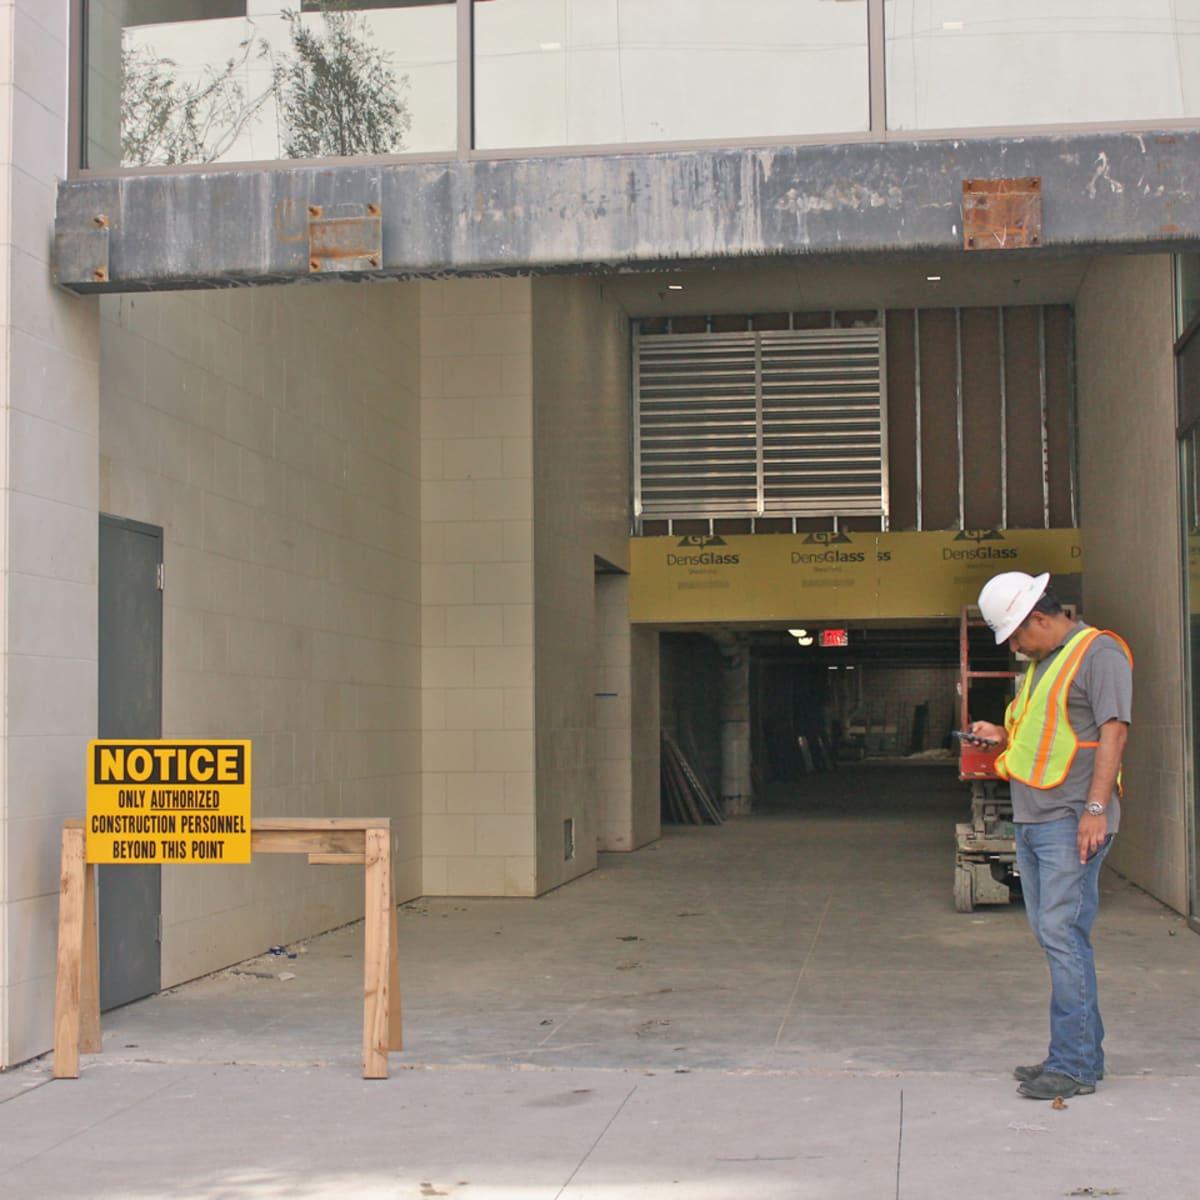 Tom Ford robbery garage entrance